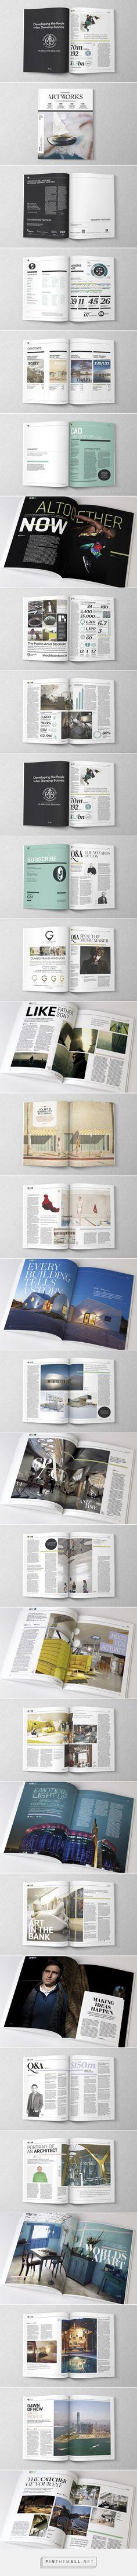 #magazine #design #inspiration - Artworks Journal Issue 2